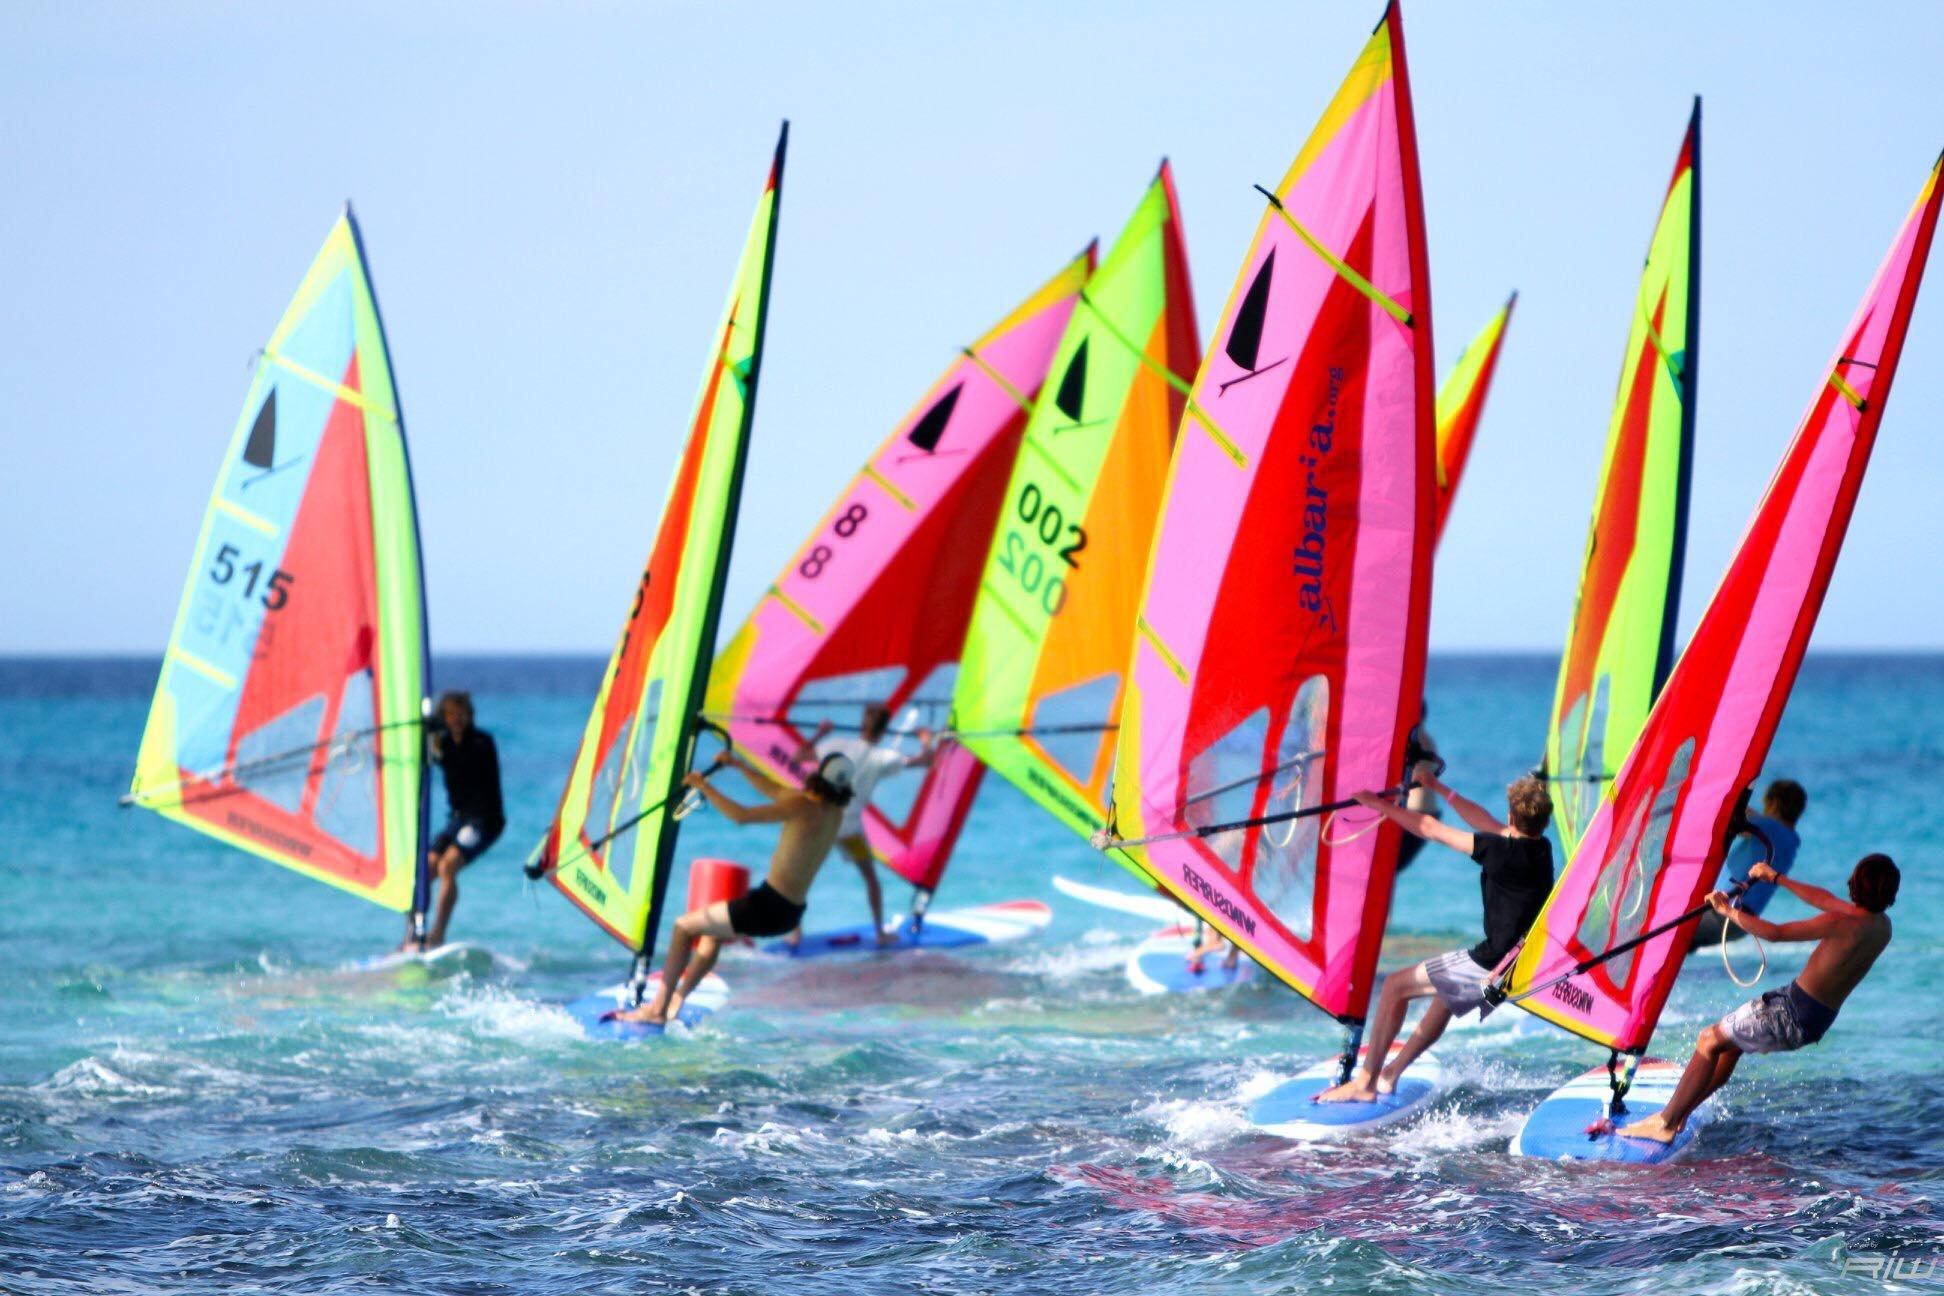 Torna a Pietrasanta la storica regata della classe WindSurfer